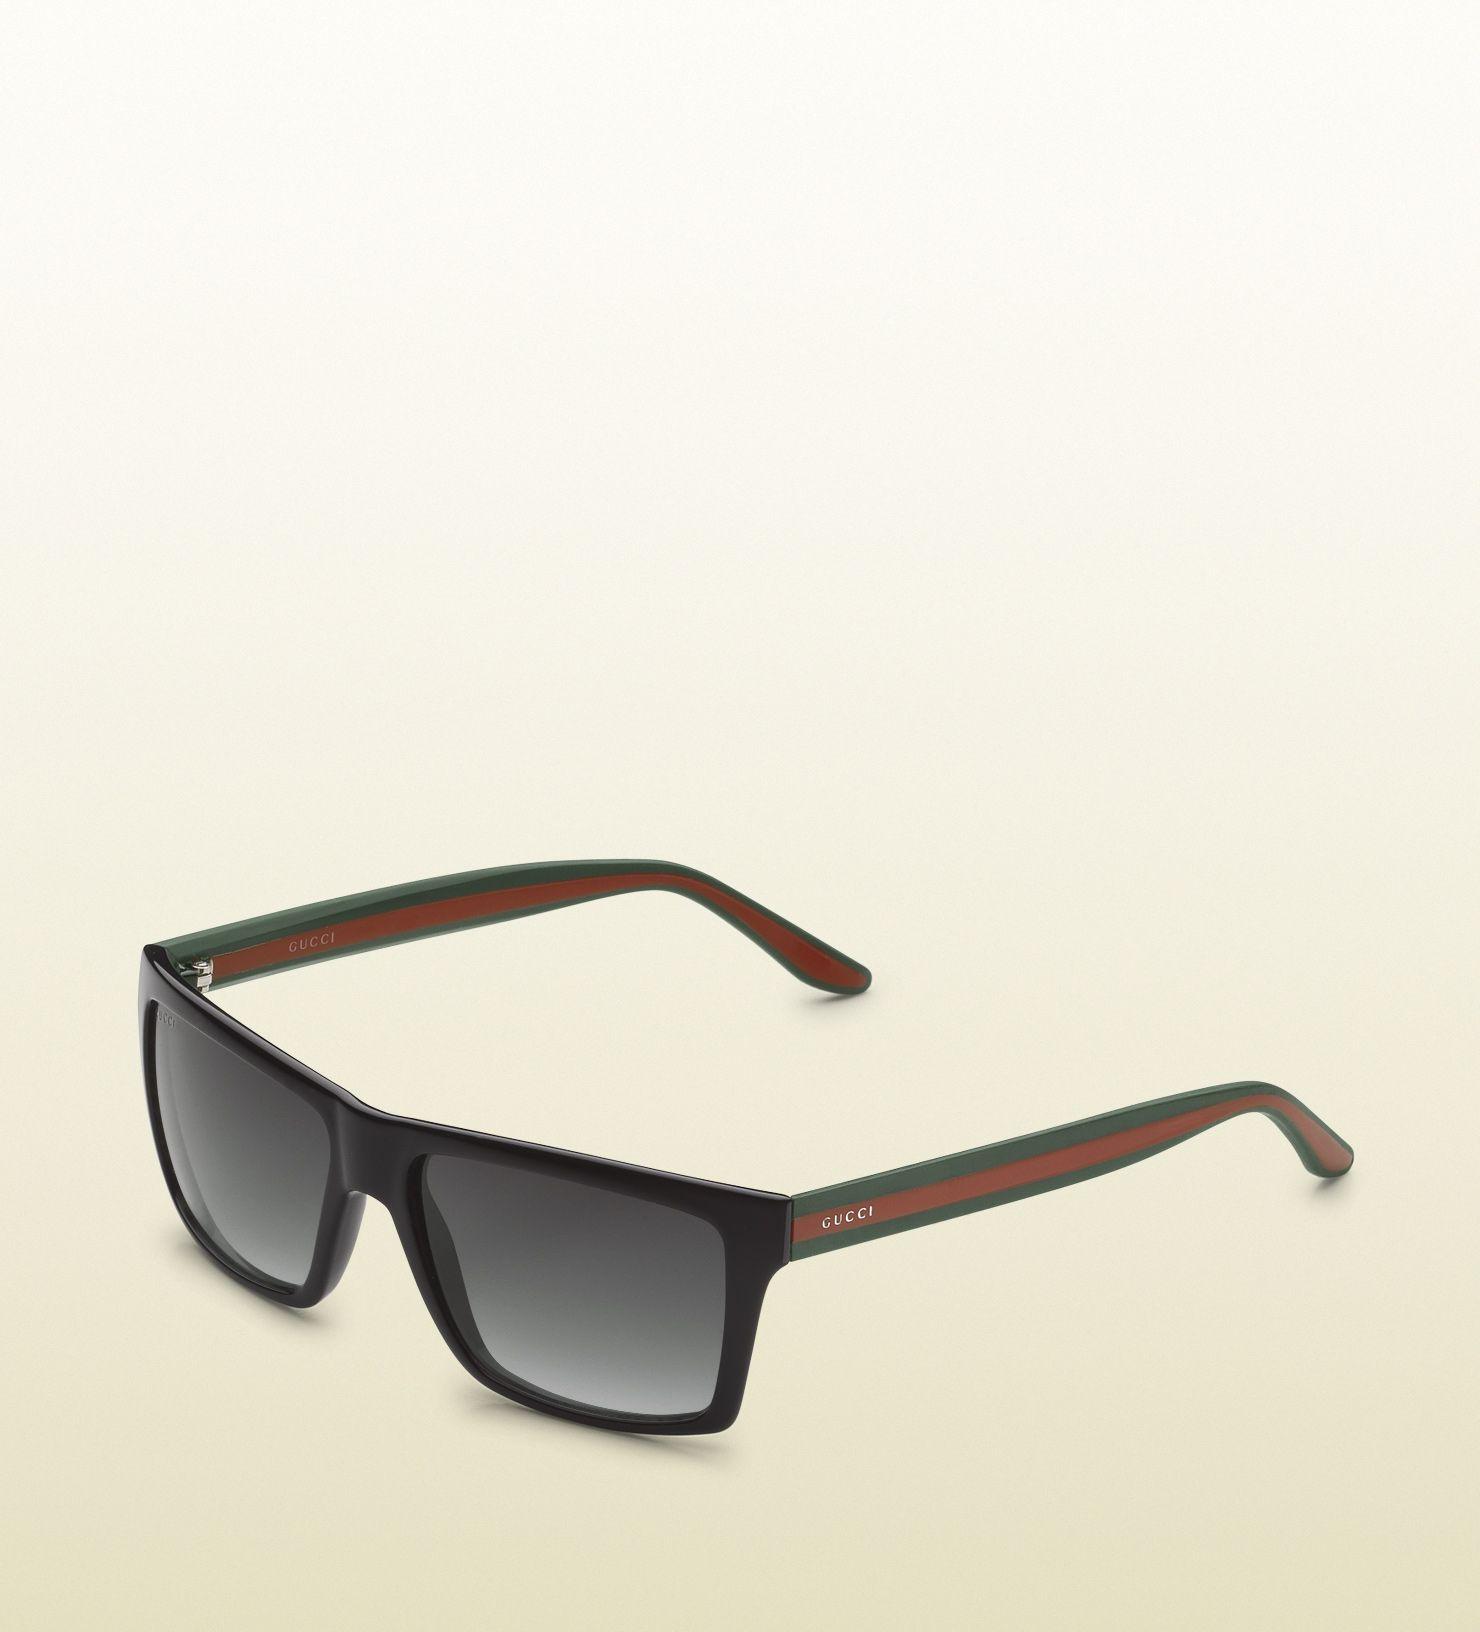 medium rectangle frame sunglasses with gucci logo o ...   Sunglasses ...